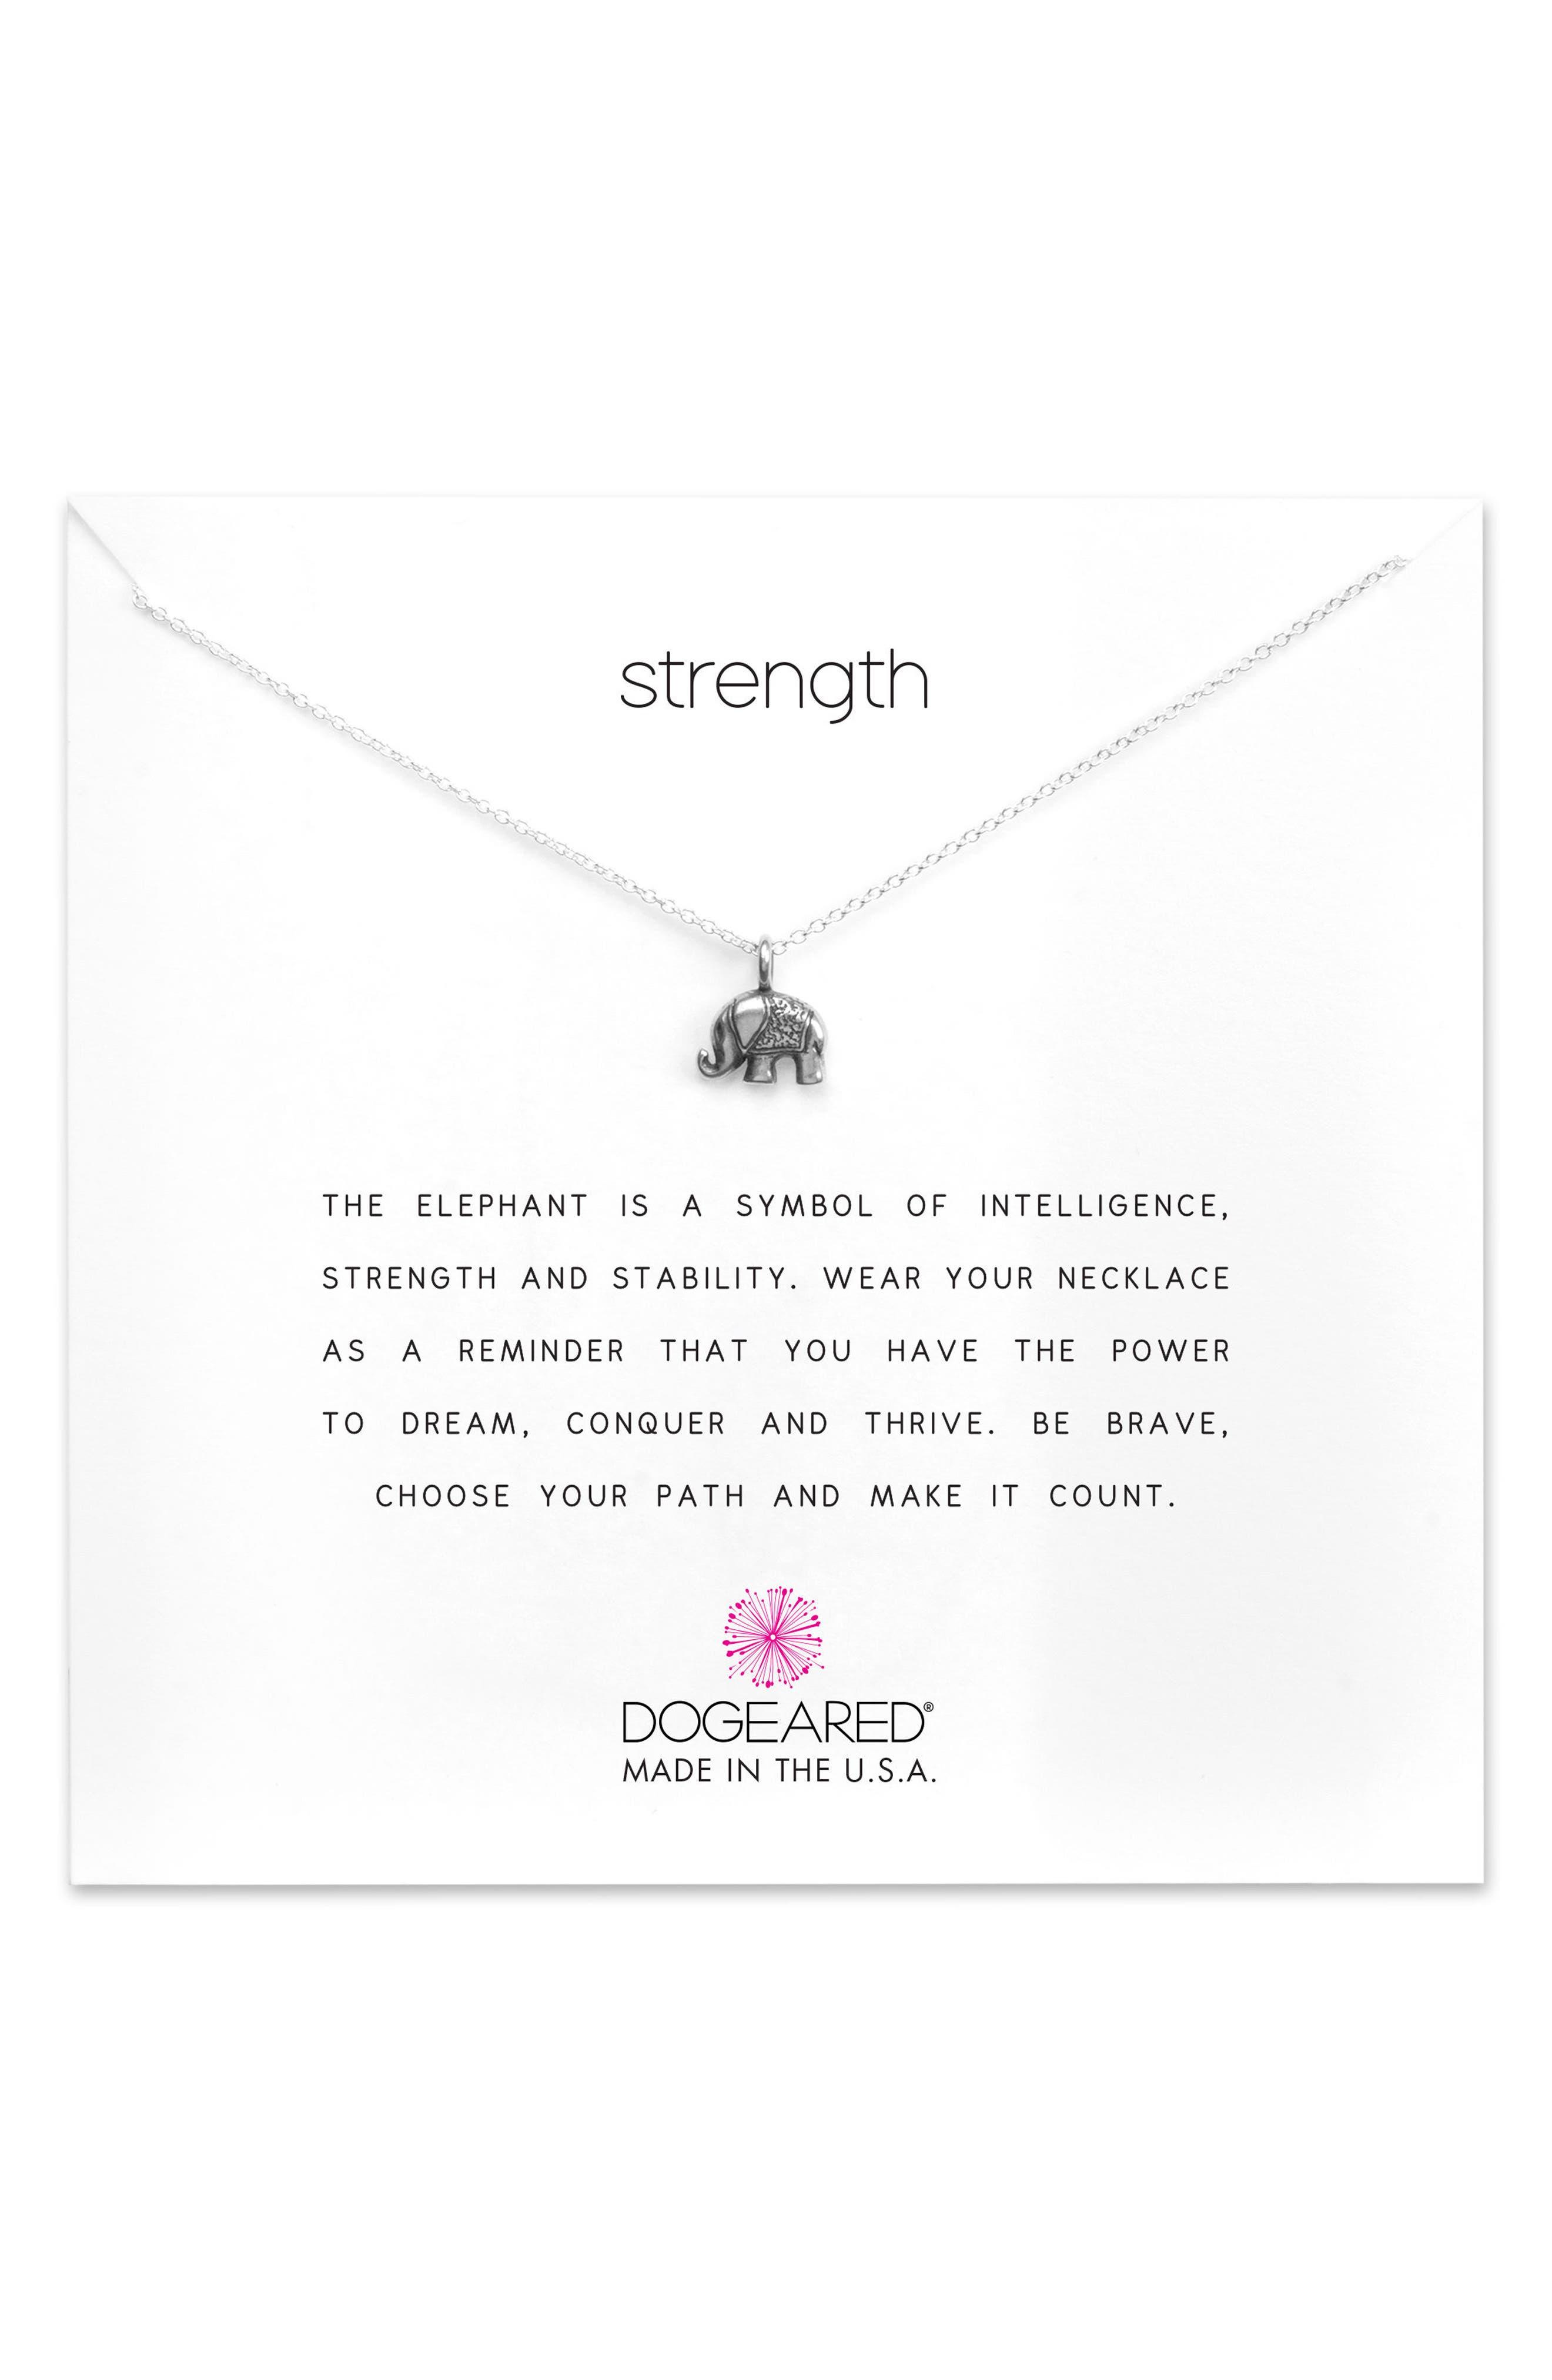 Dogeared Reminder - Strength Pendant Necklace